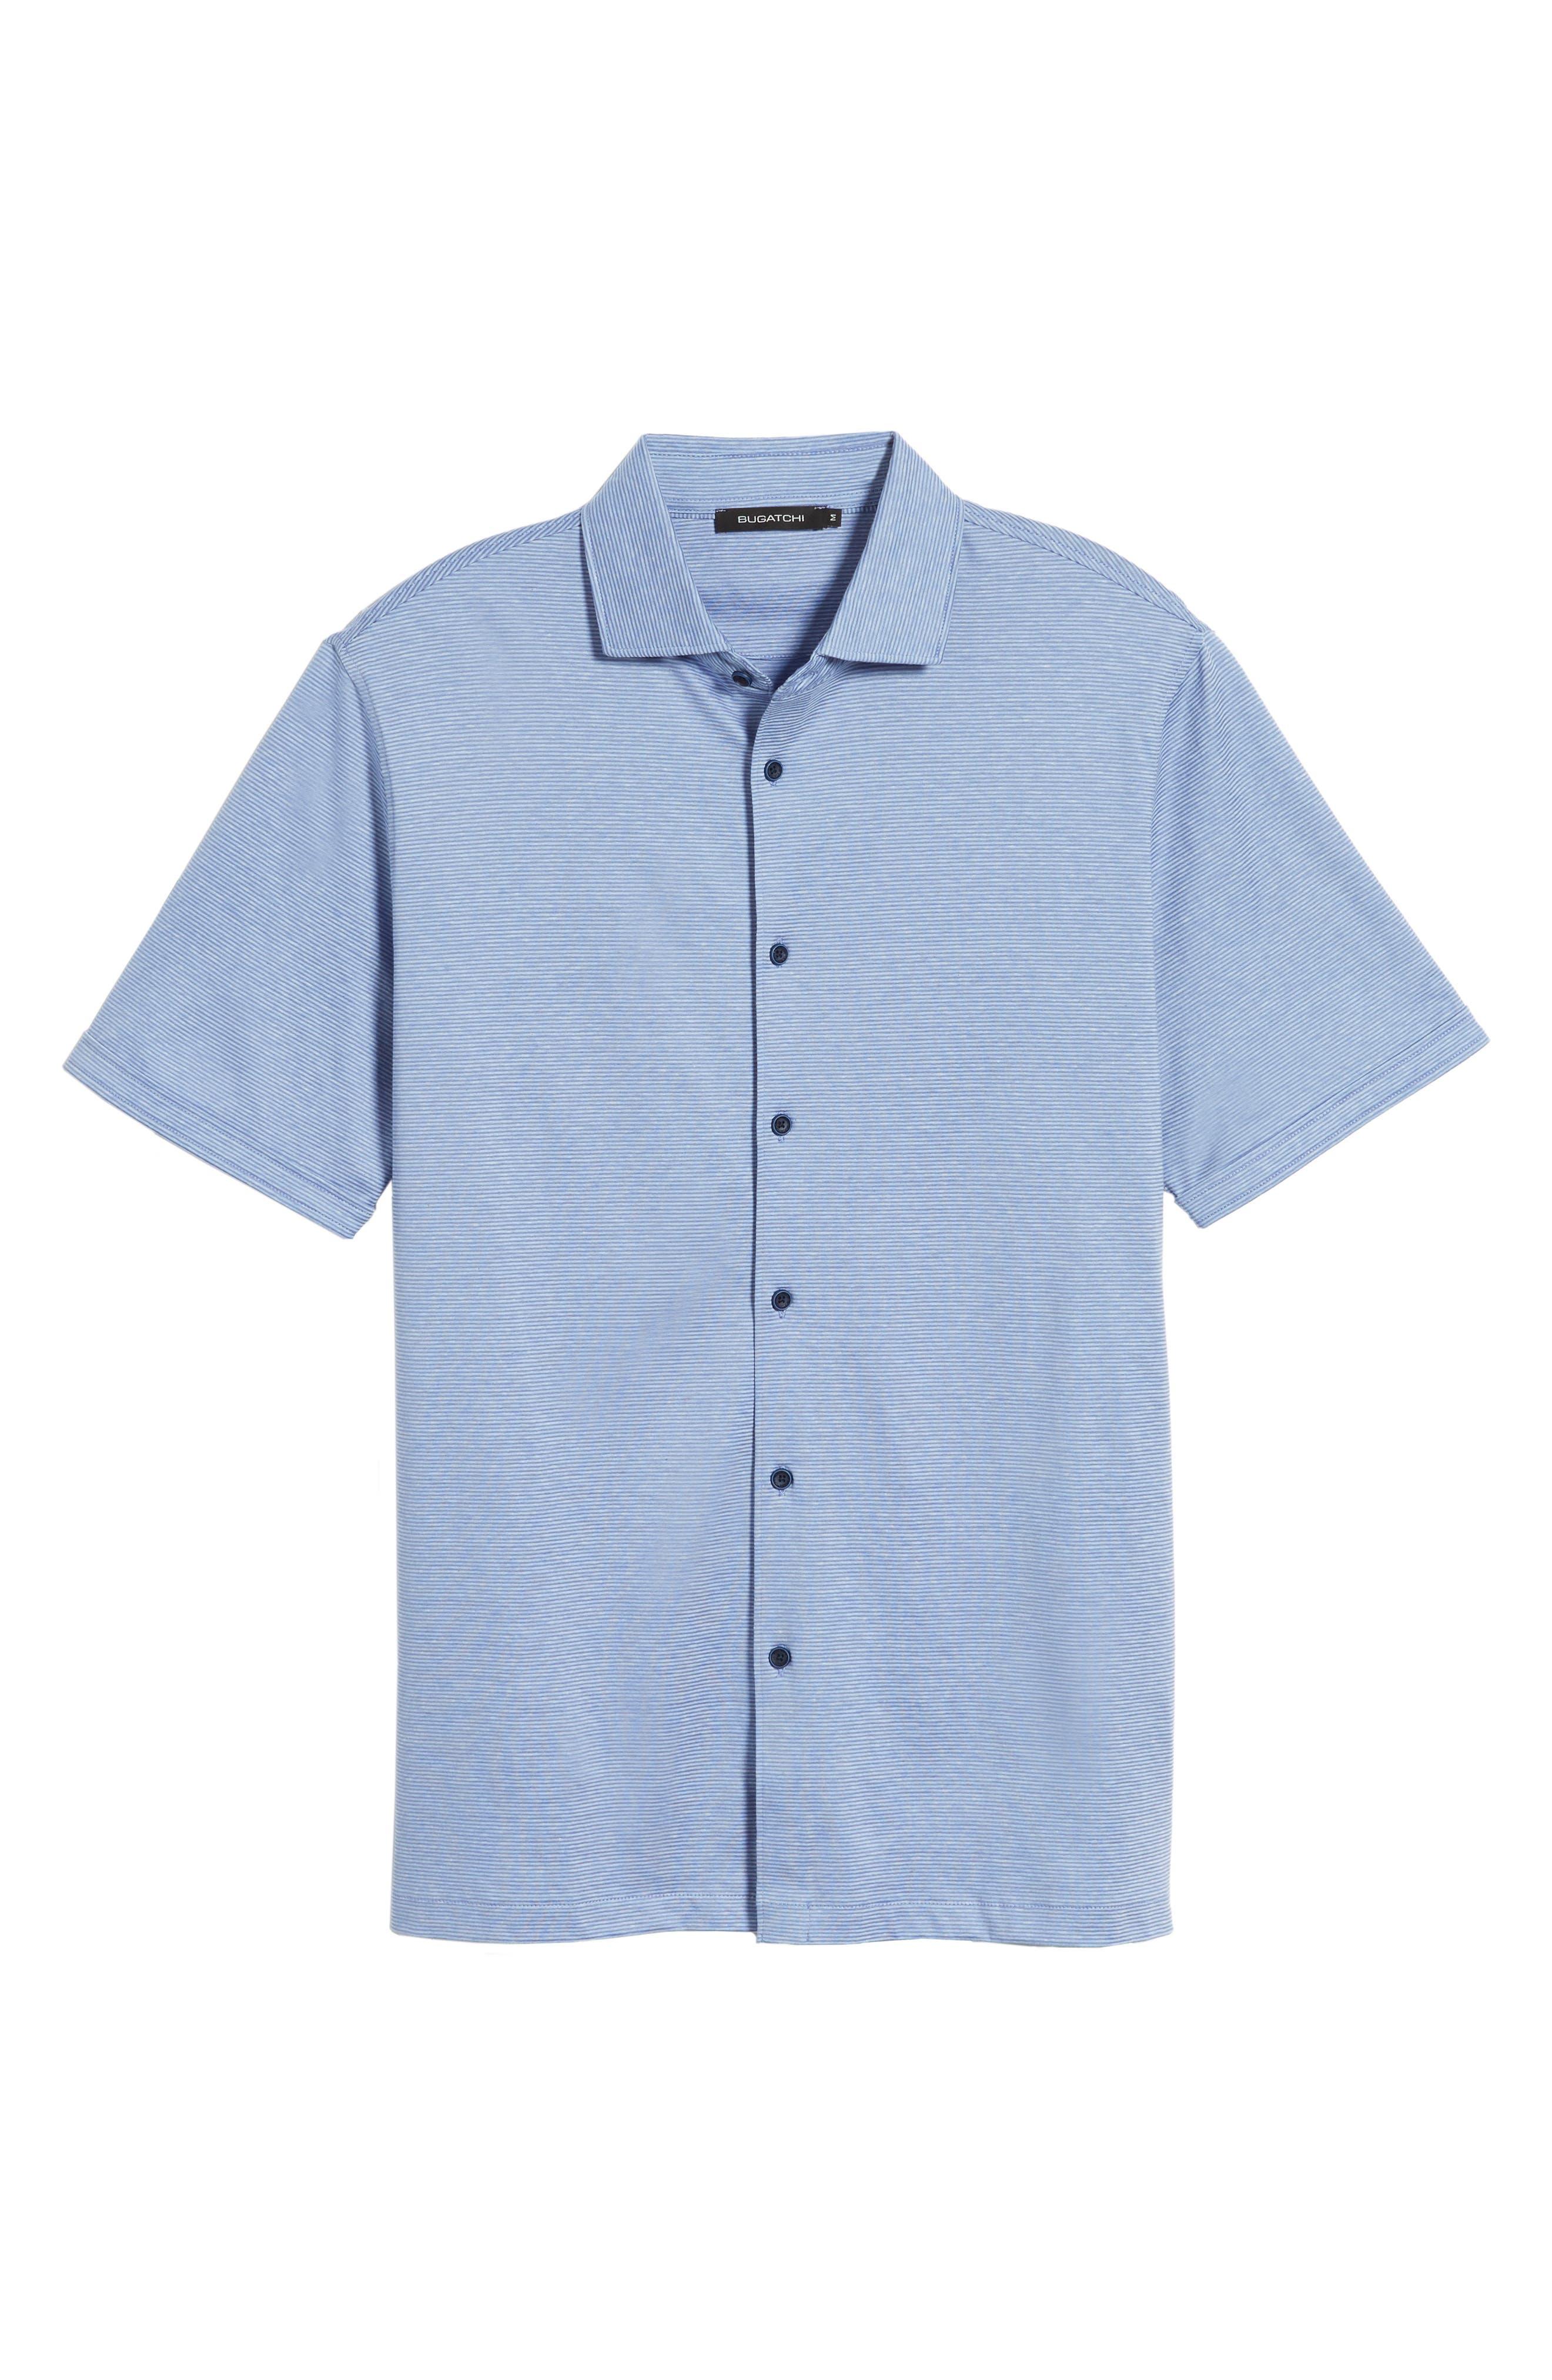 Regular Fit Knit Sport Shirt,                             Alternate thumbnail 6, color,                             Lilac